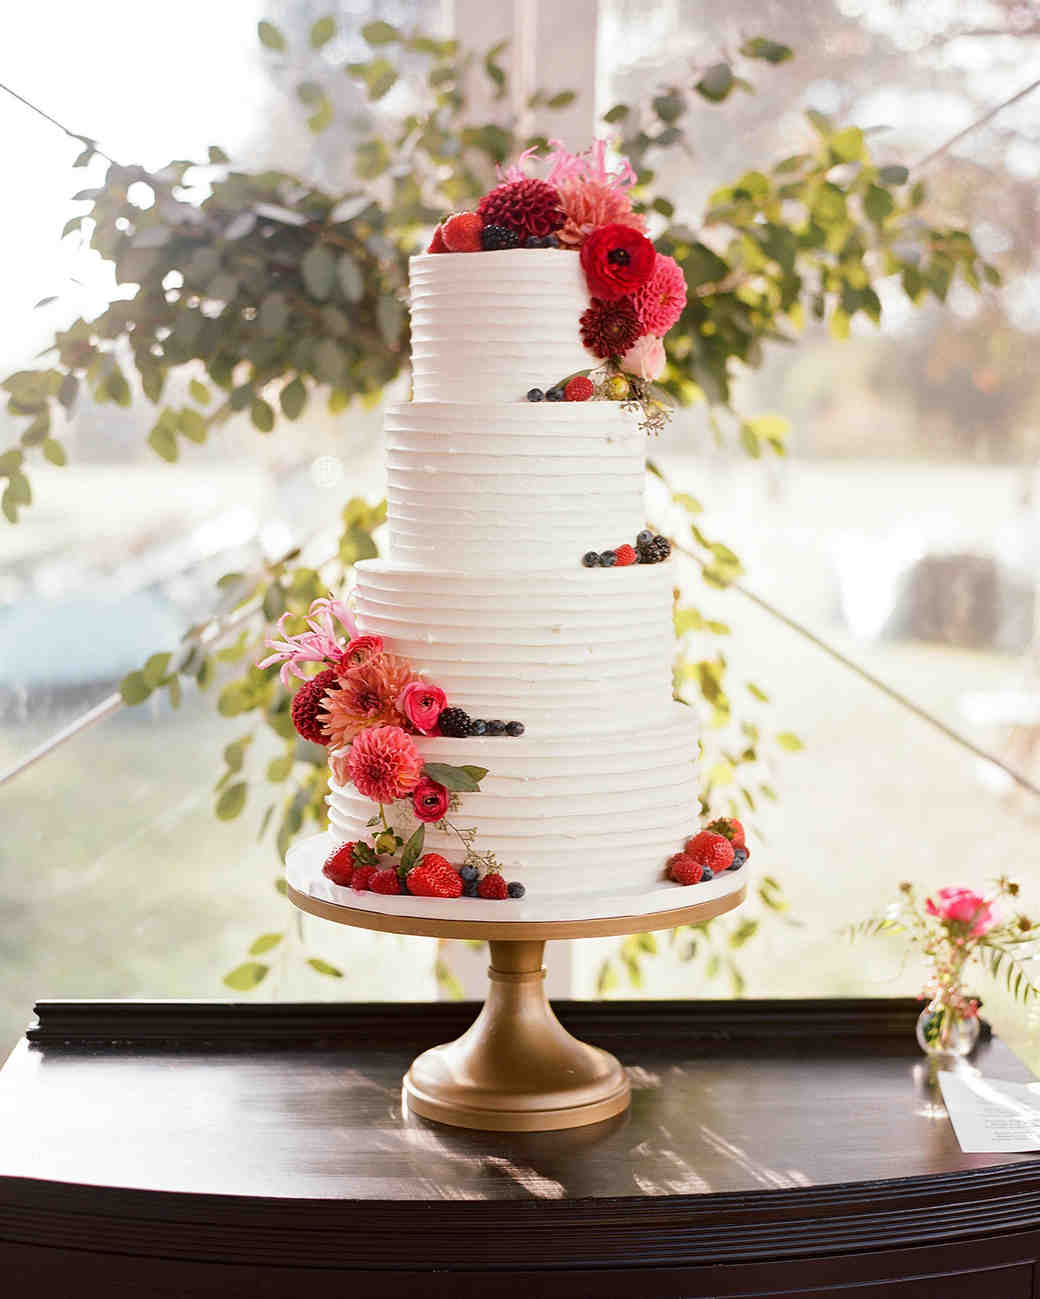 jen geoff wedding tiered cake